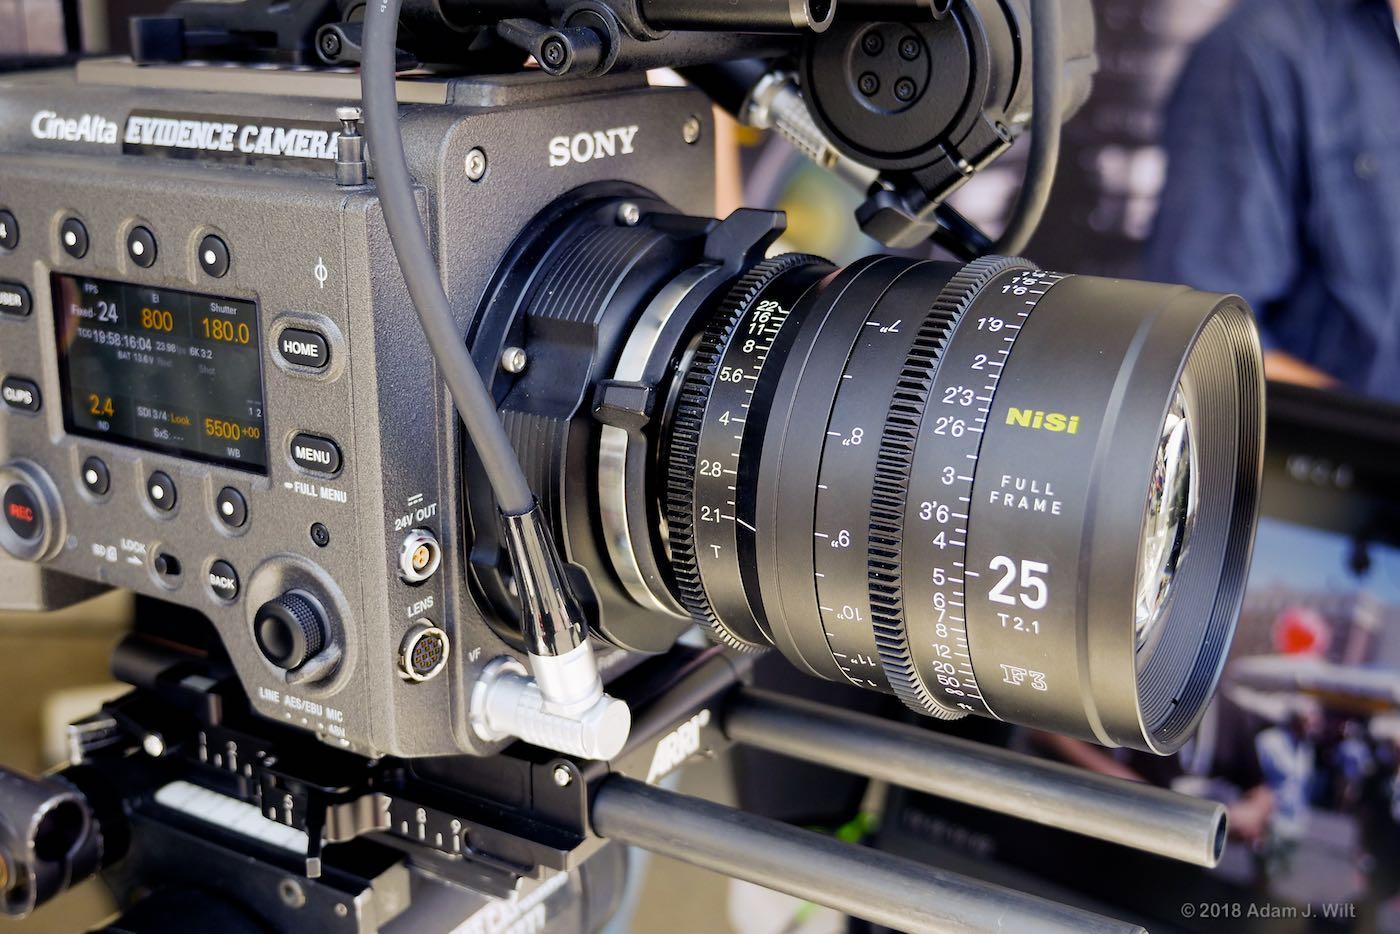 NiSi F3 lens